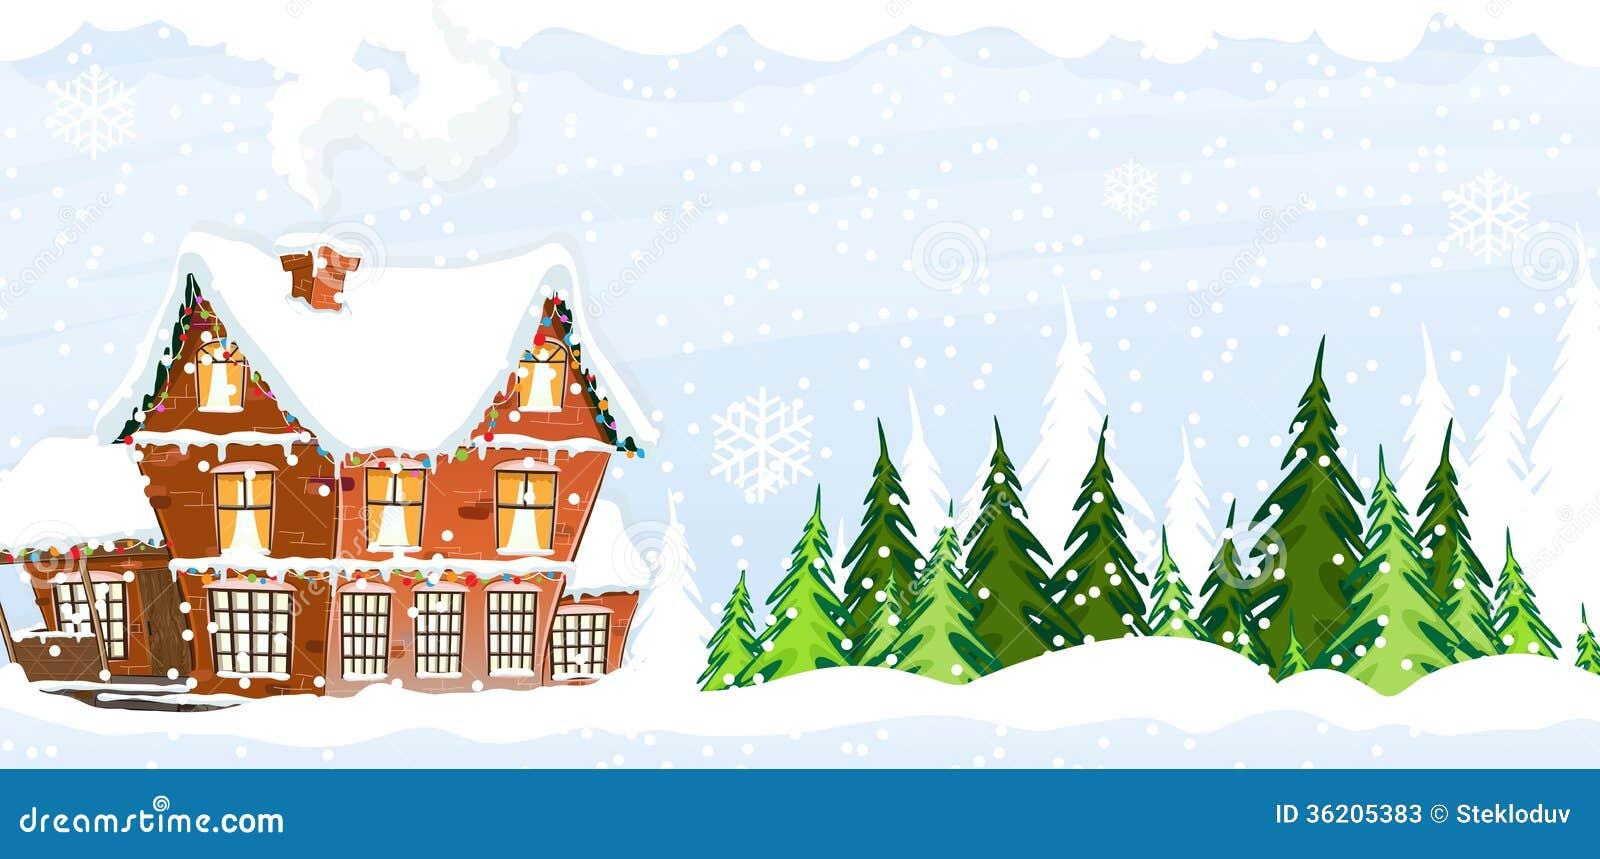 Snow covered Farmhouse Stock Photos Image 36205383